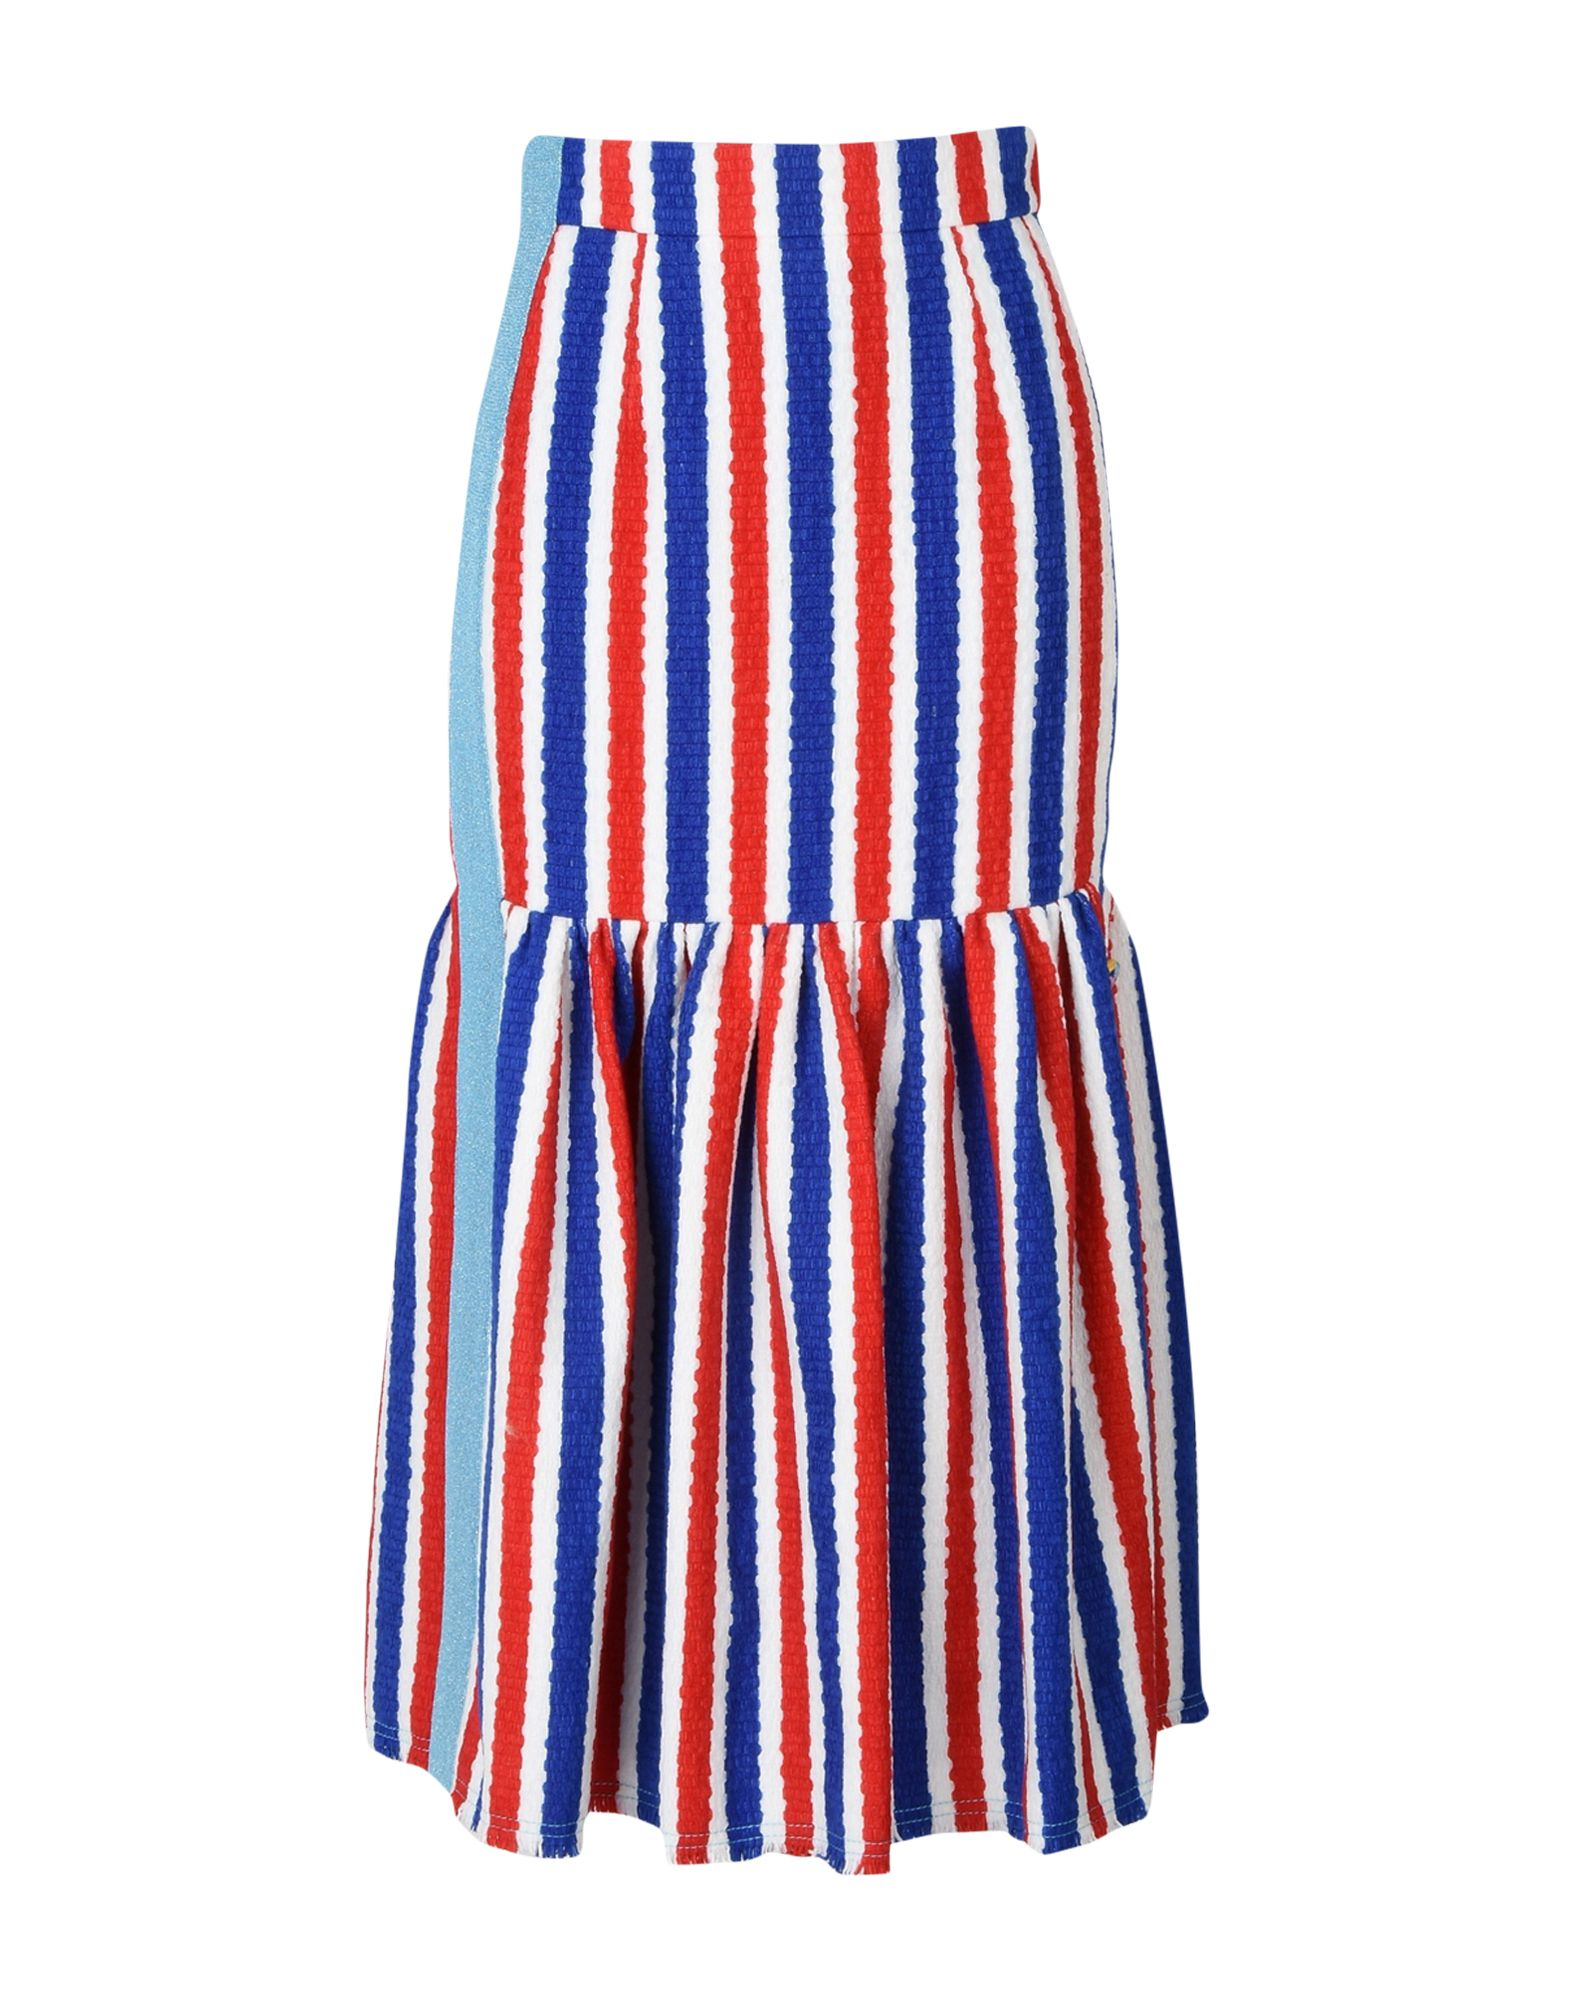 LUCKY CHOUETTE Юбка длиной 3/4 moschino couture юбка длиной 3 4